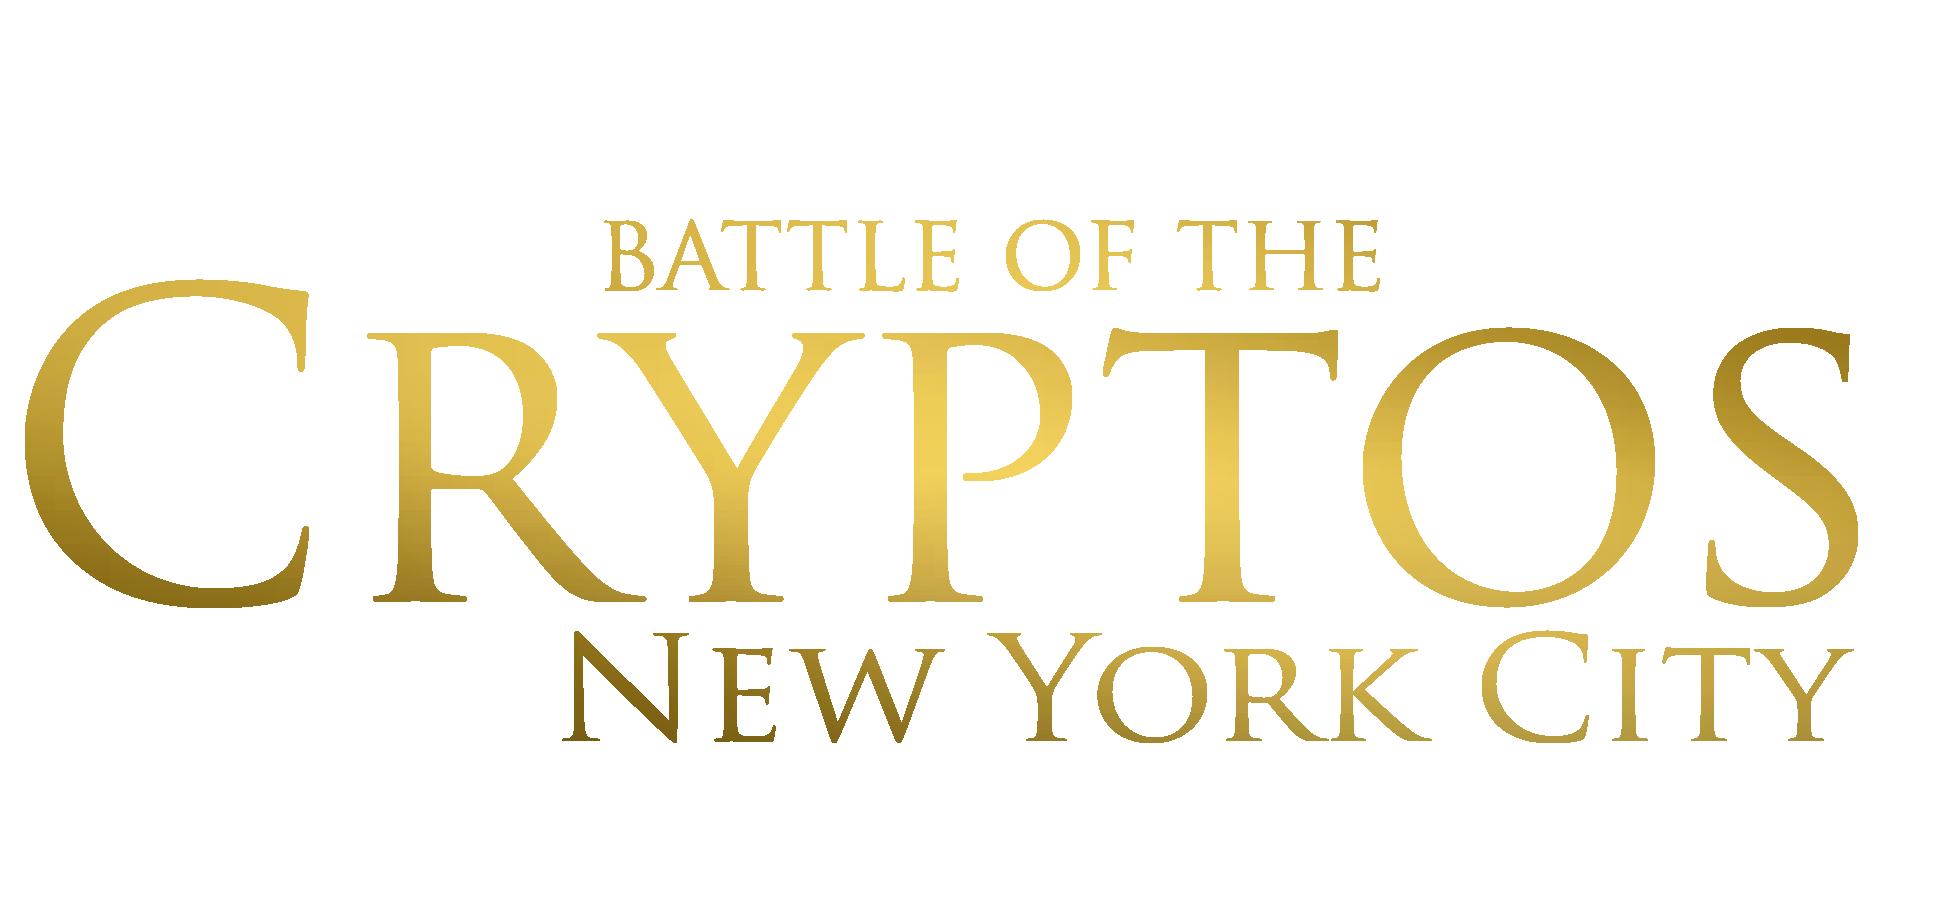 https://www.battlecryptos.com